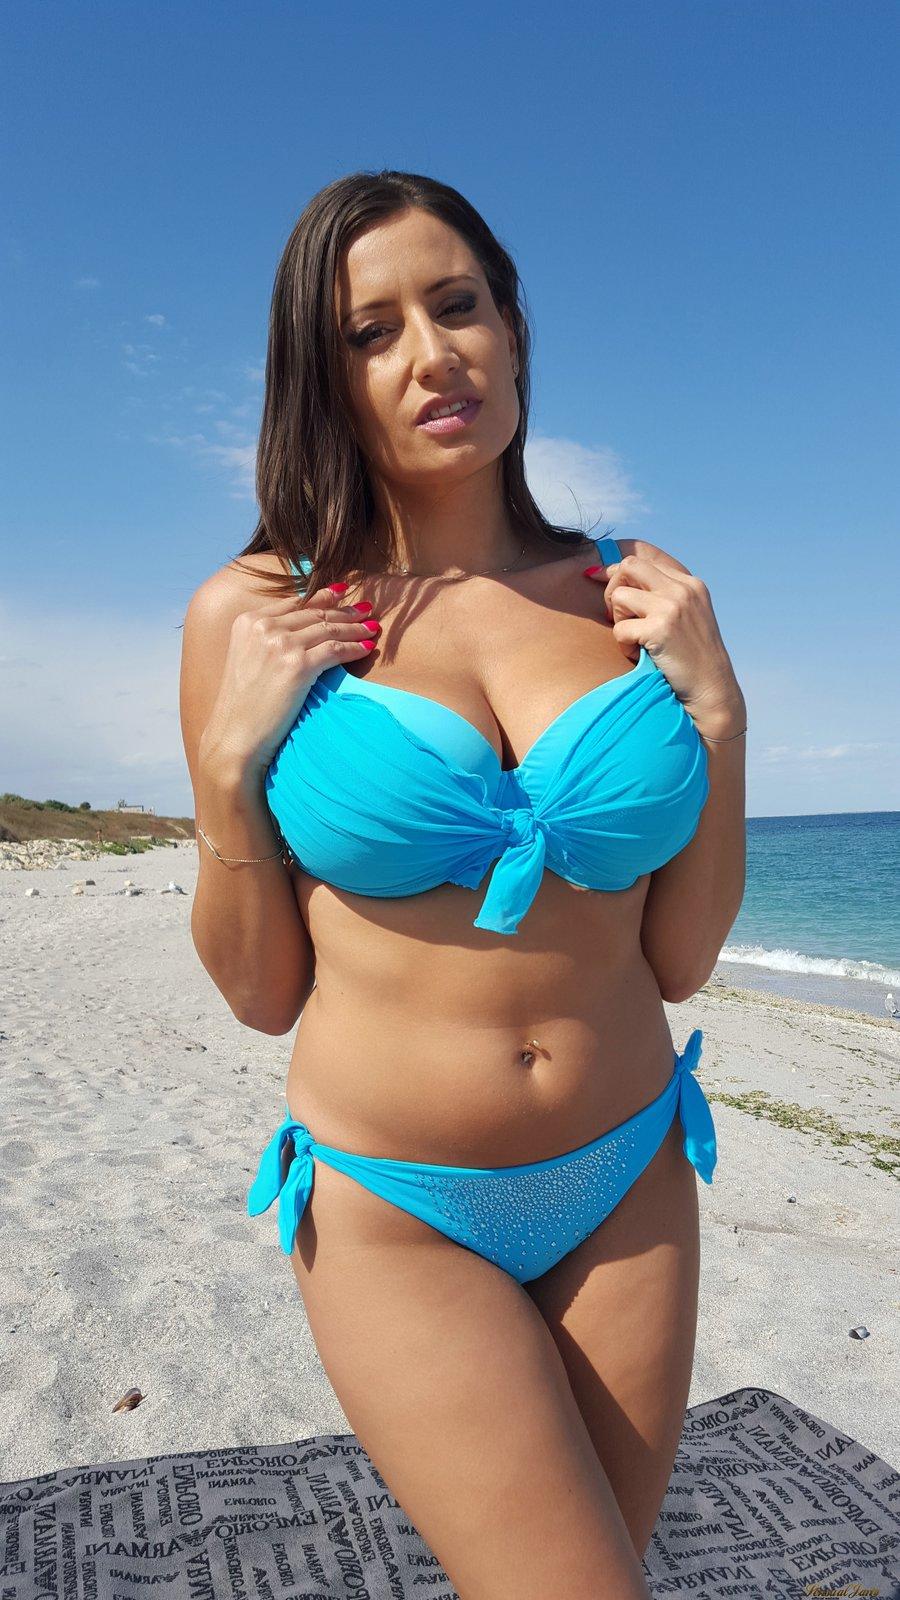 Girls in bikini at beach